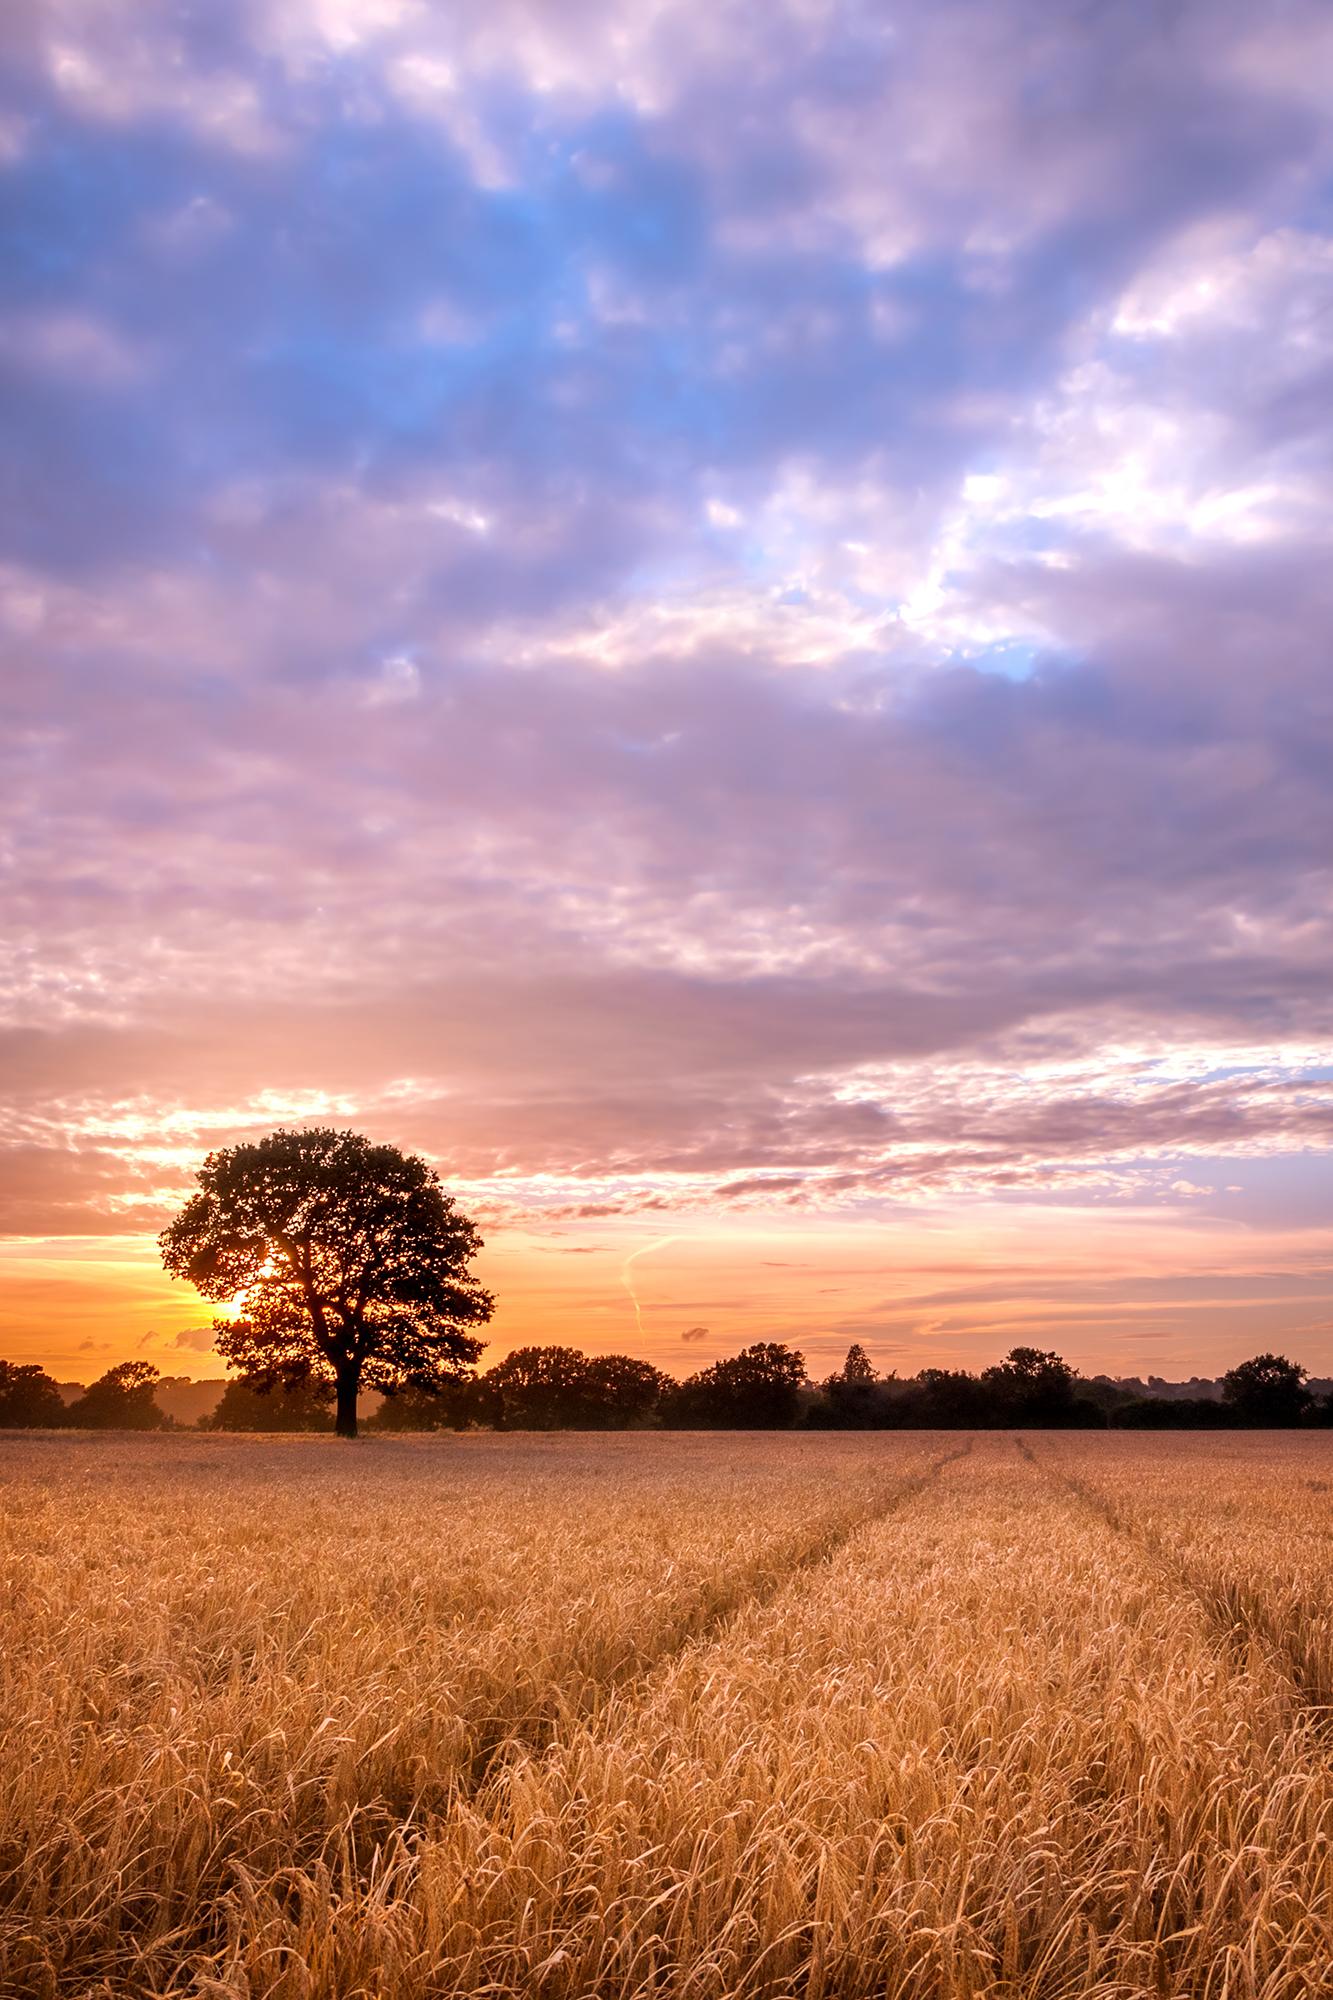 120828 - Surrey - Sunset - Chaldon Field 002.jpg